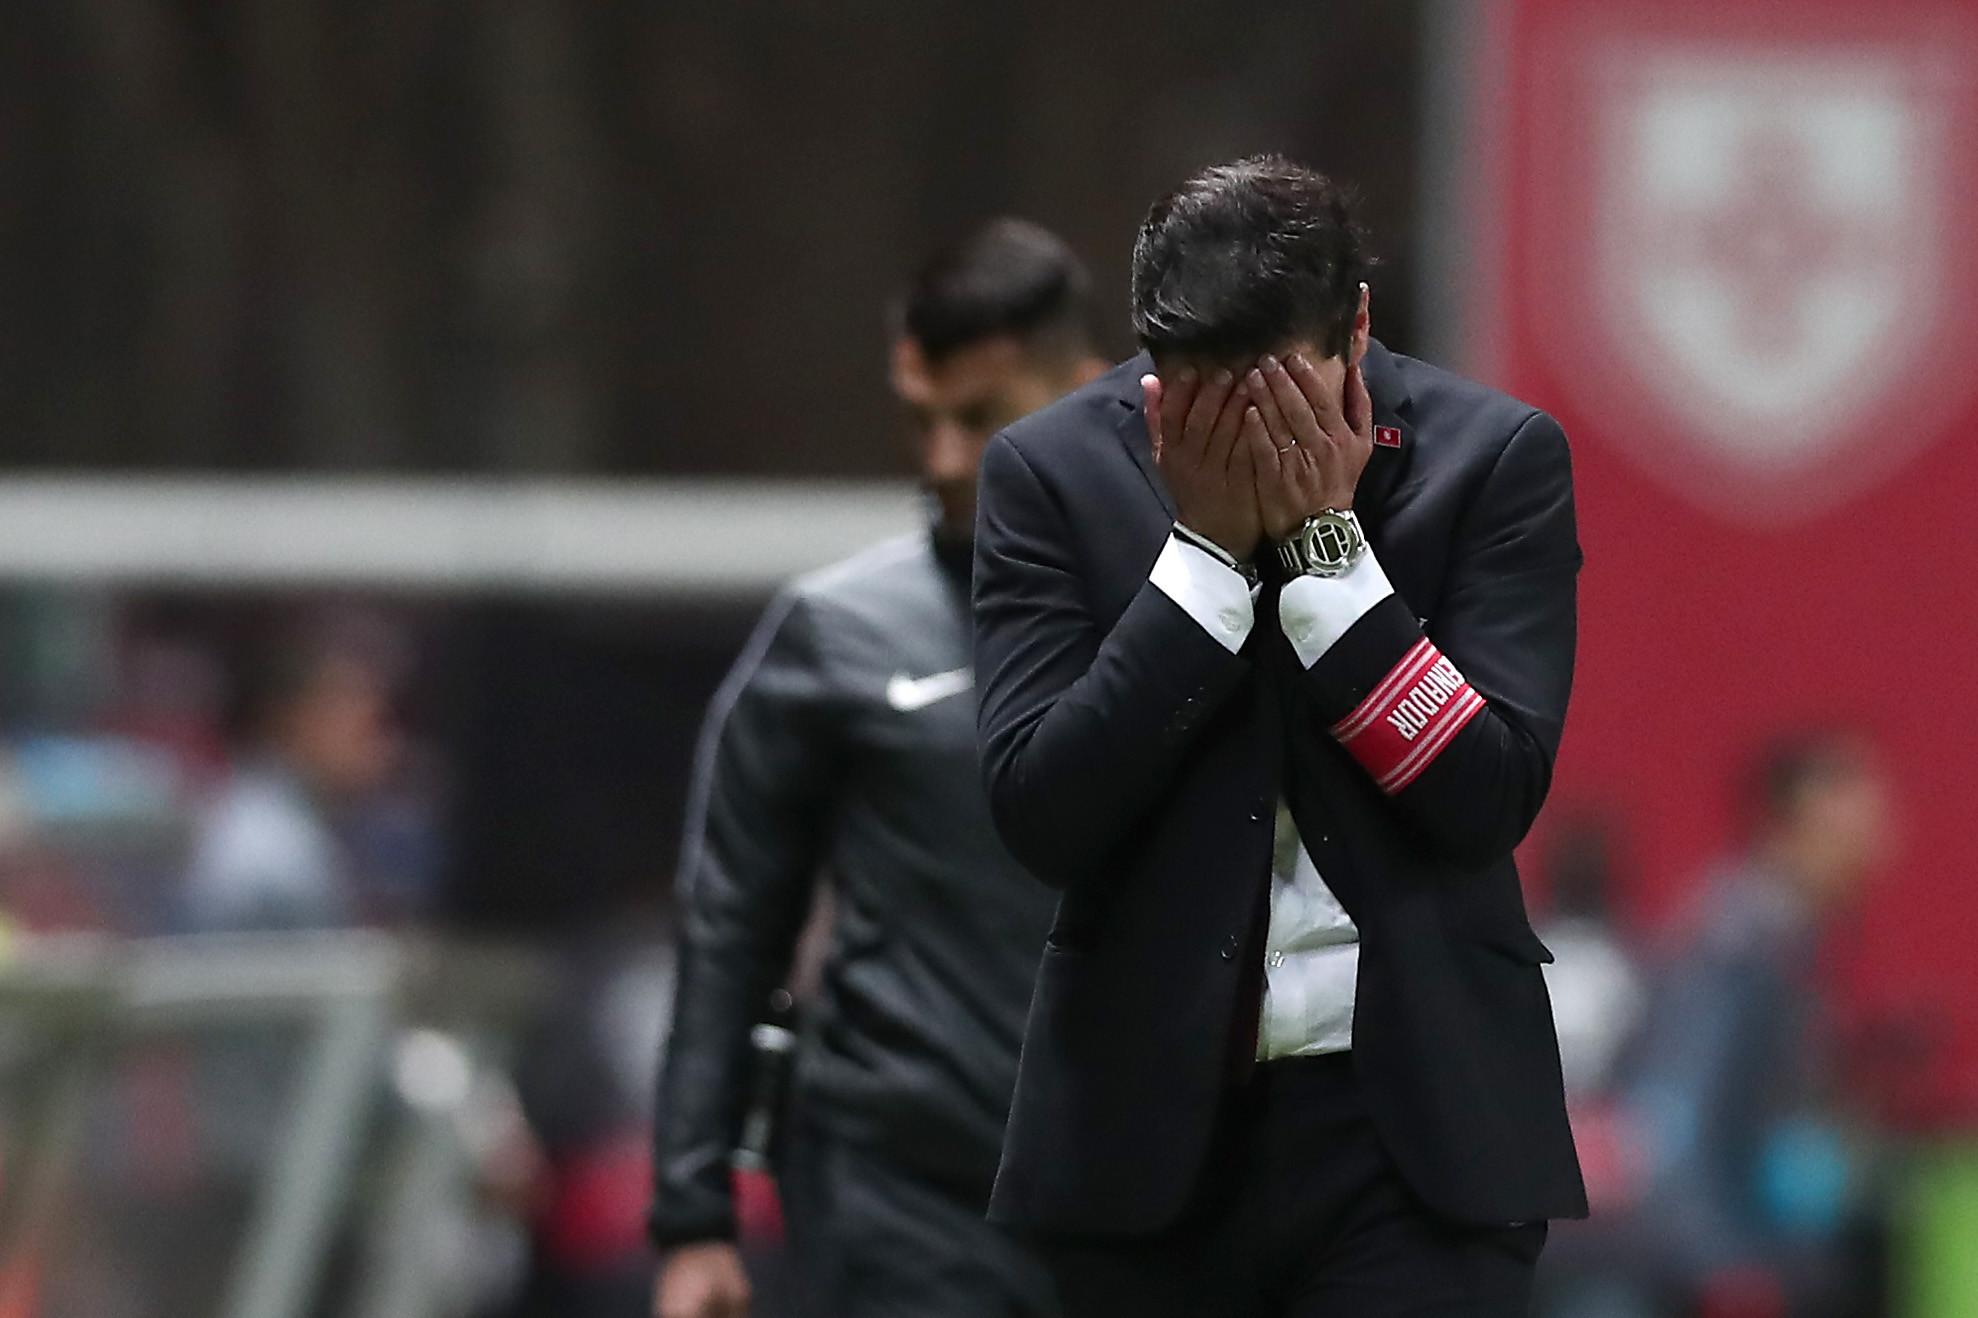 """No final do jogo dei os parabéns ao Ivo Vieira"""